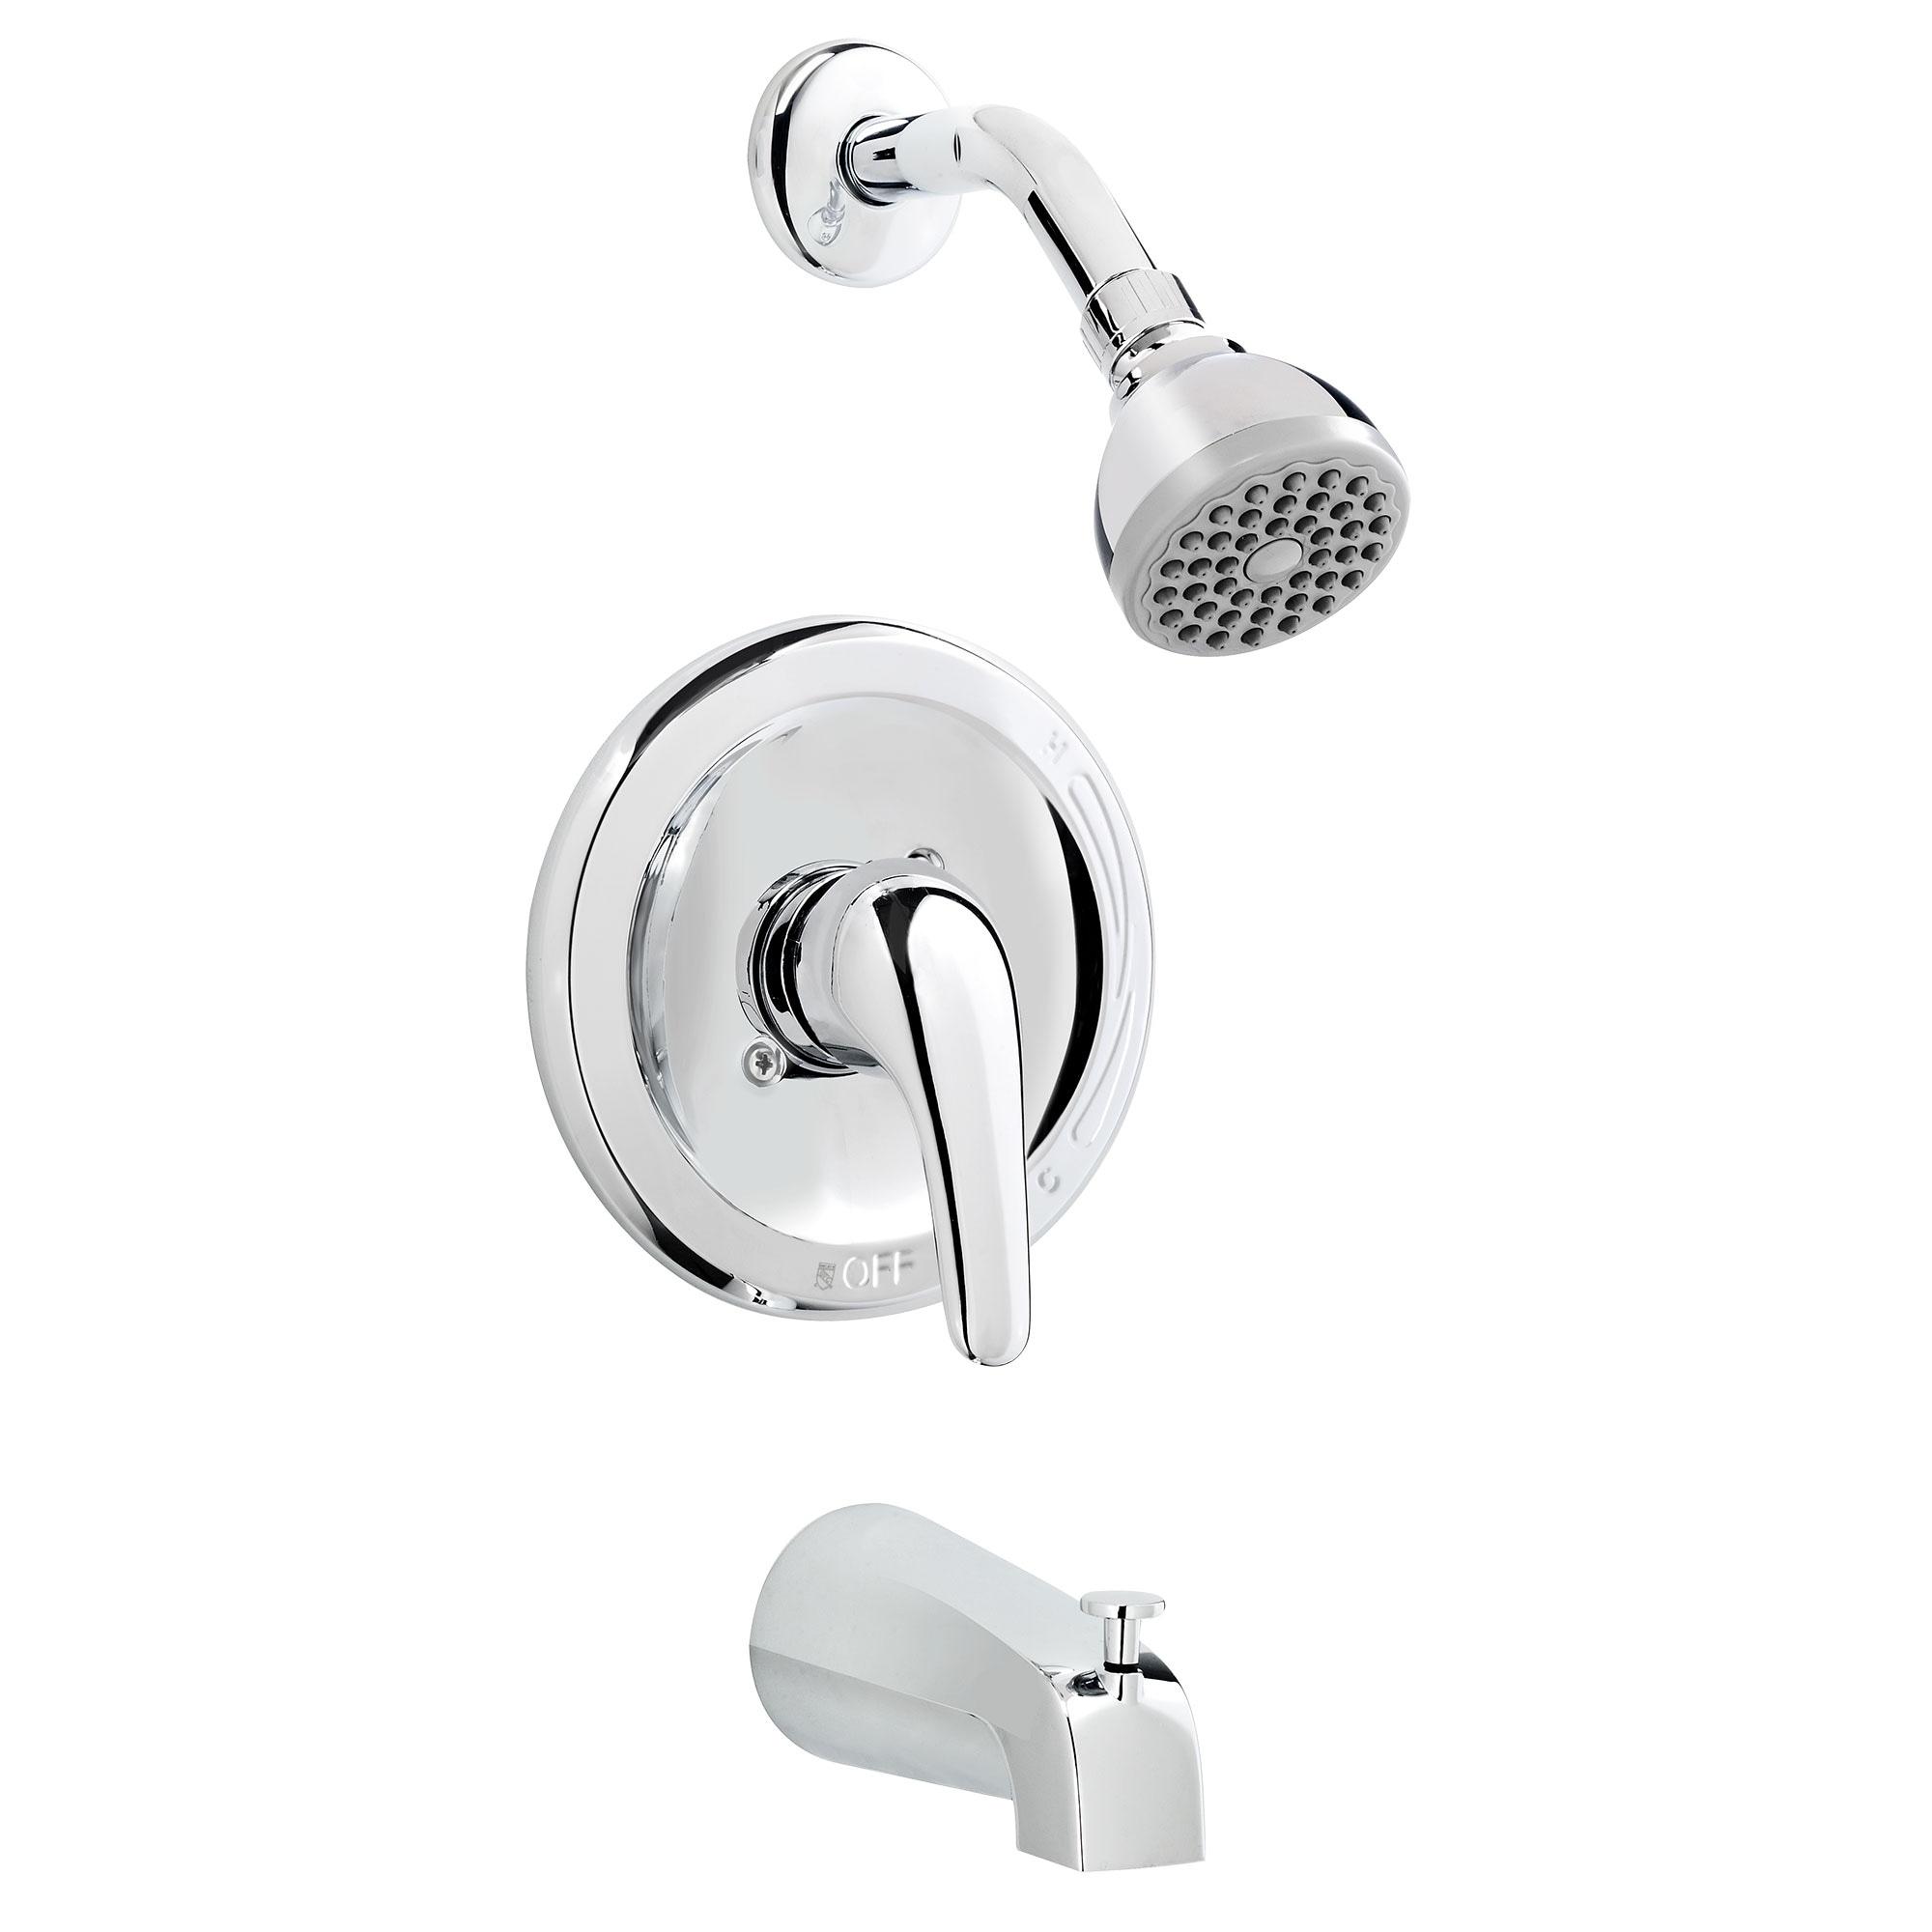 Shop Belanger EBY90CCP Single Handle Tub and Shower Faucet Combo